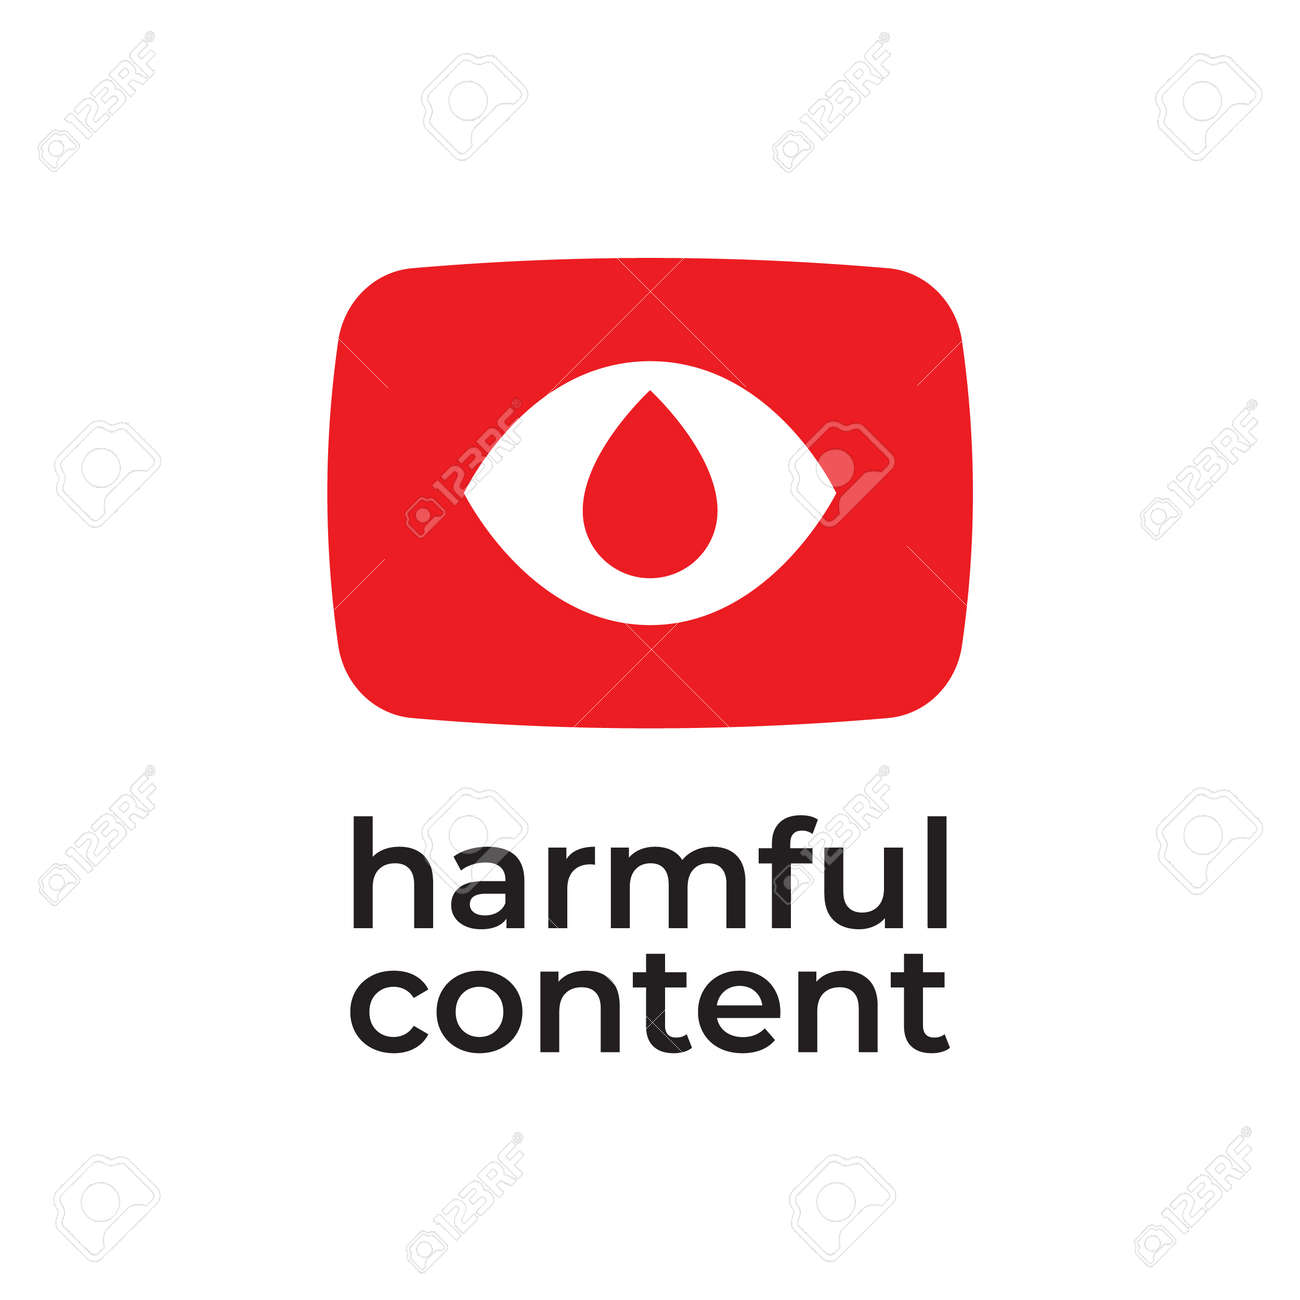 Parental control icon, vector clip art. Harmful content. Warning sign, notice, danger sign. Social problem. - 163226510